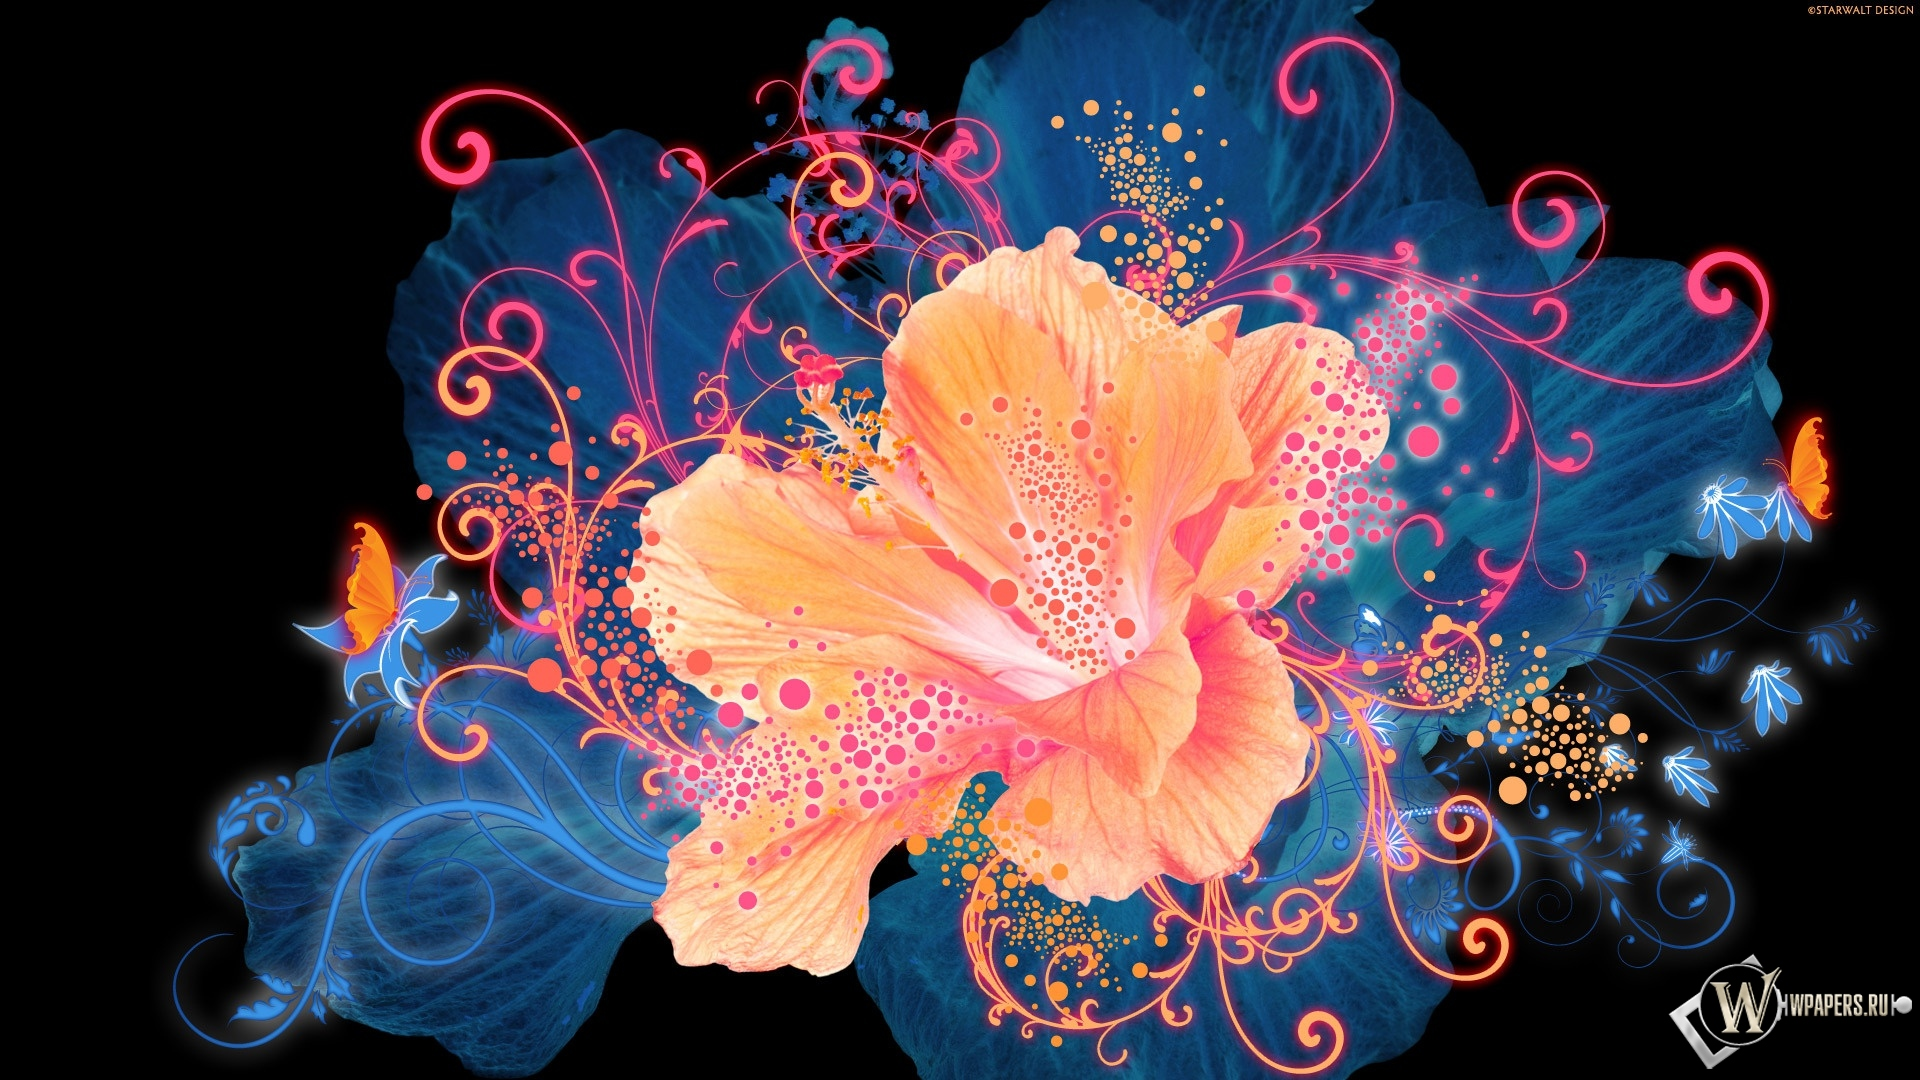 Светящийся цветок 1920x1080